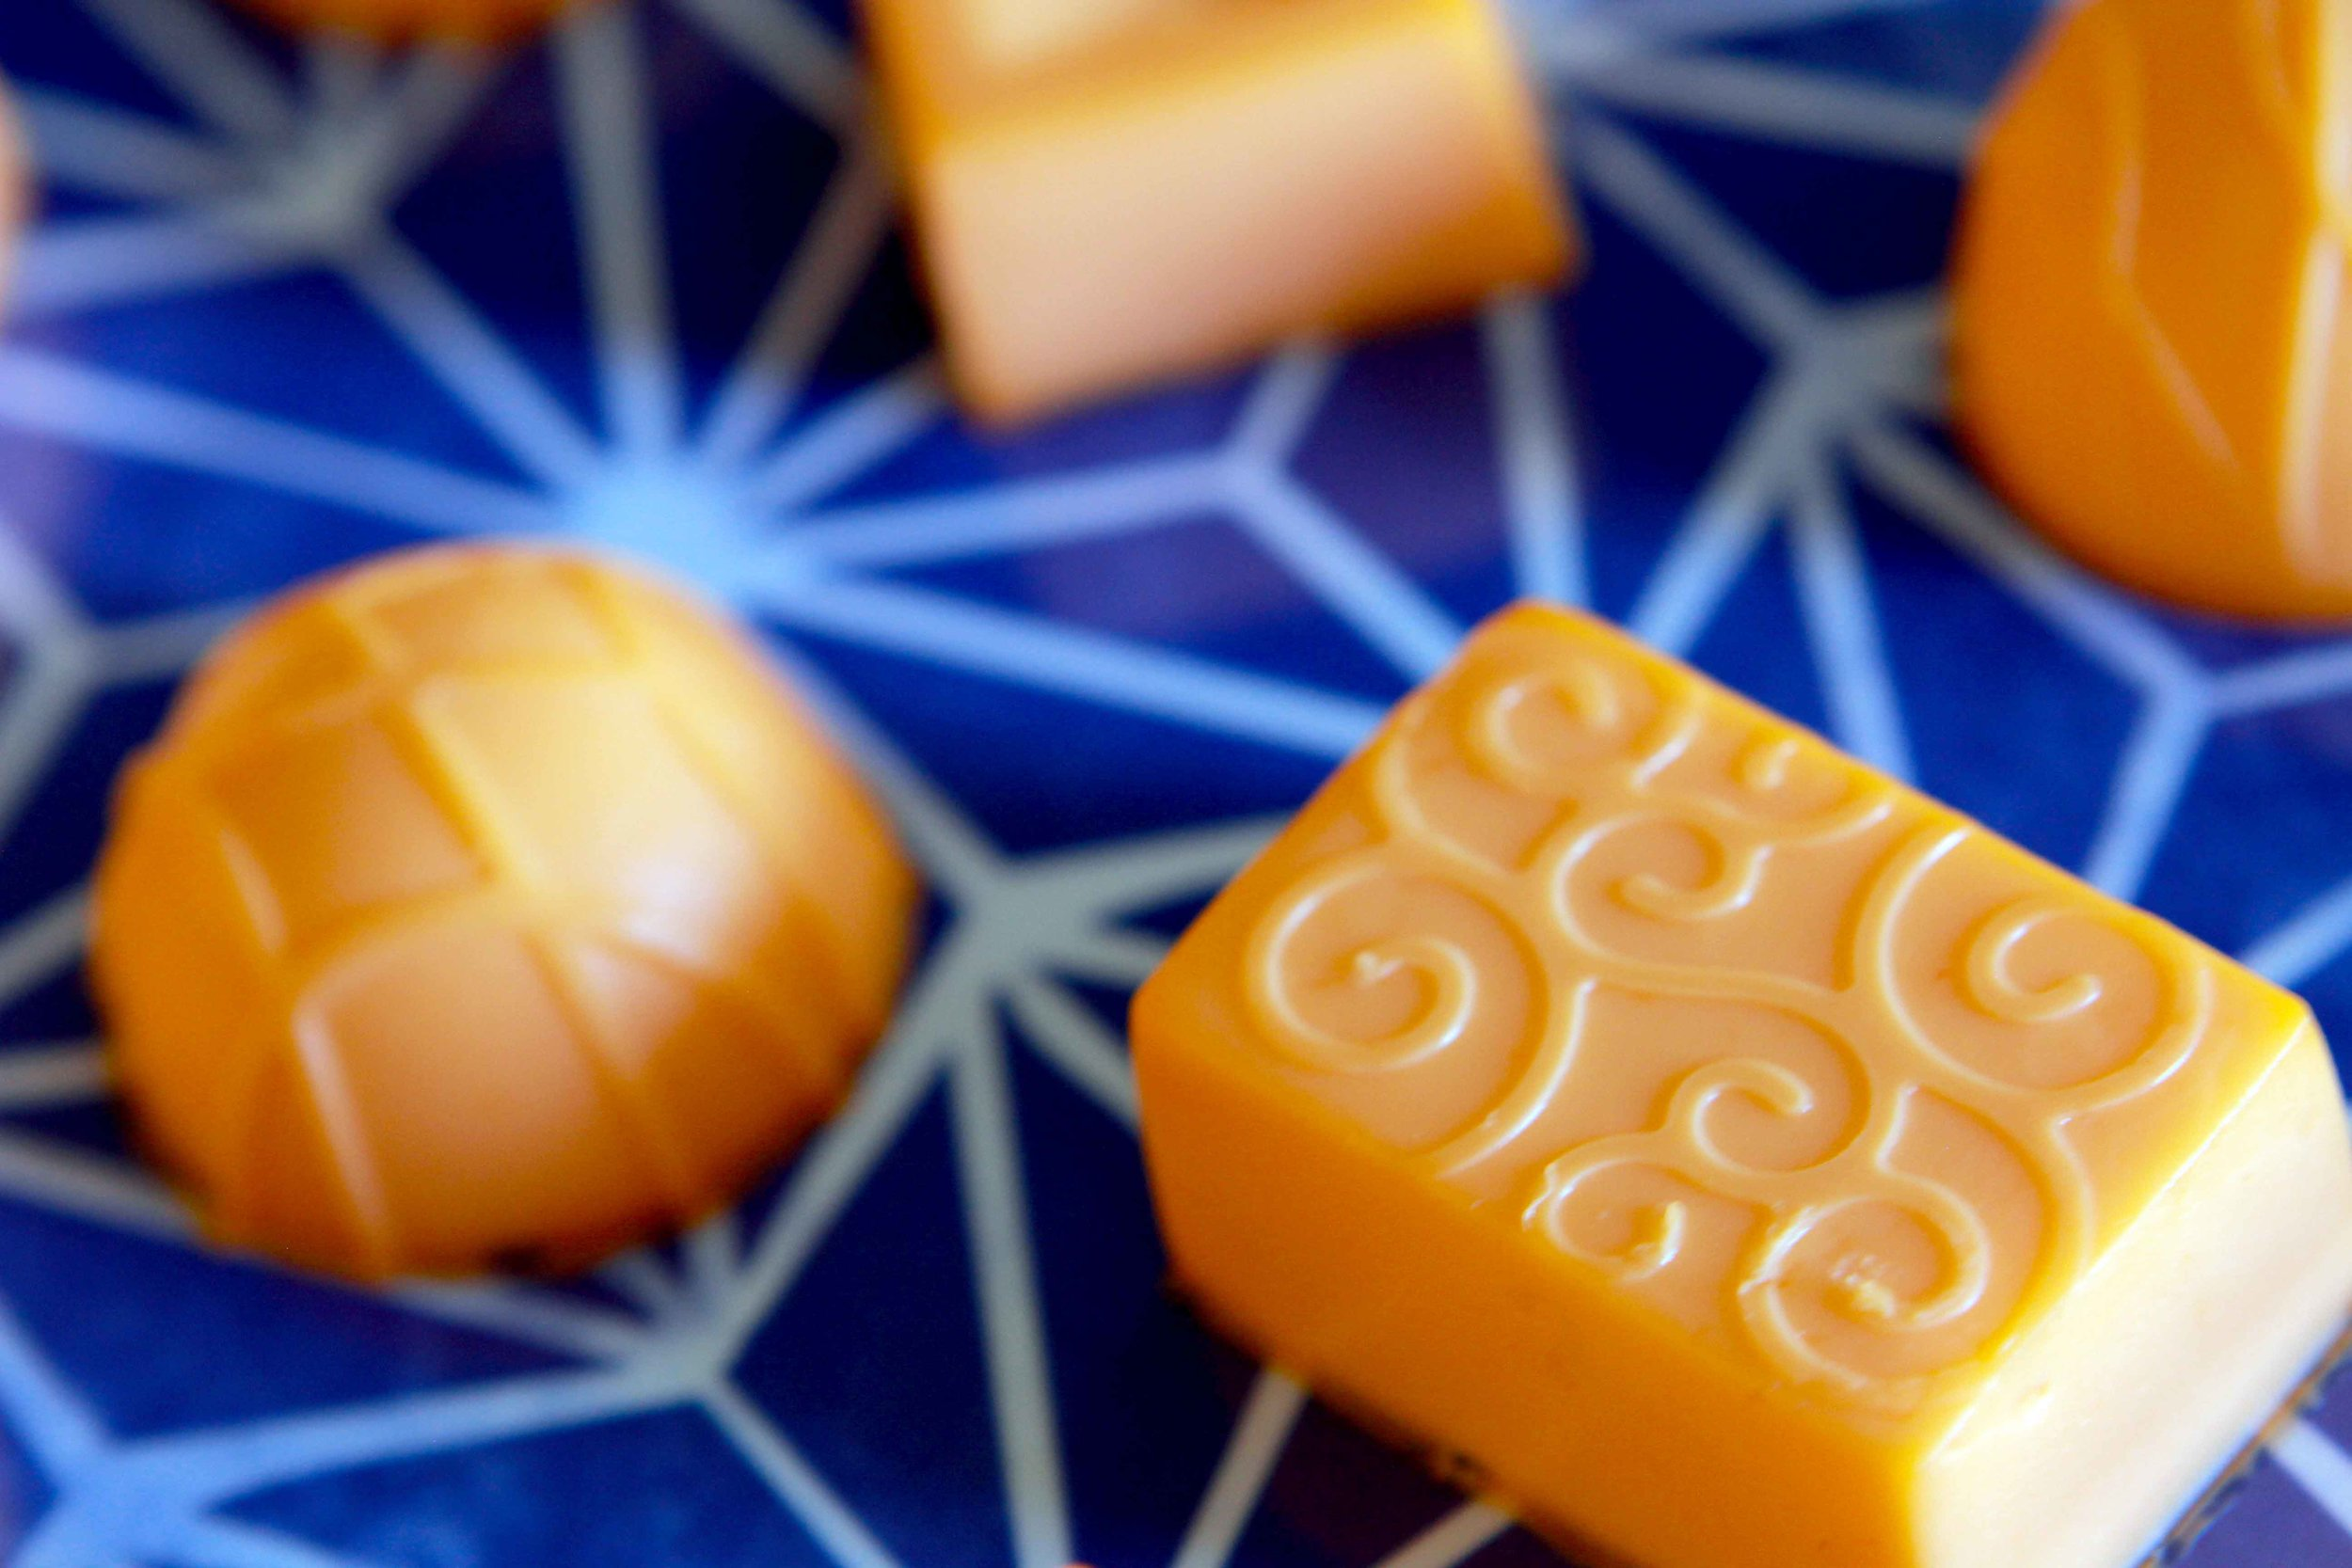 Low Carb Keto Orange Creamsicle Gummy Candy Recipe